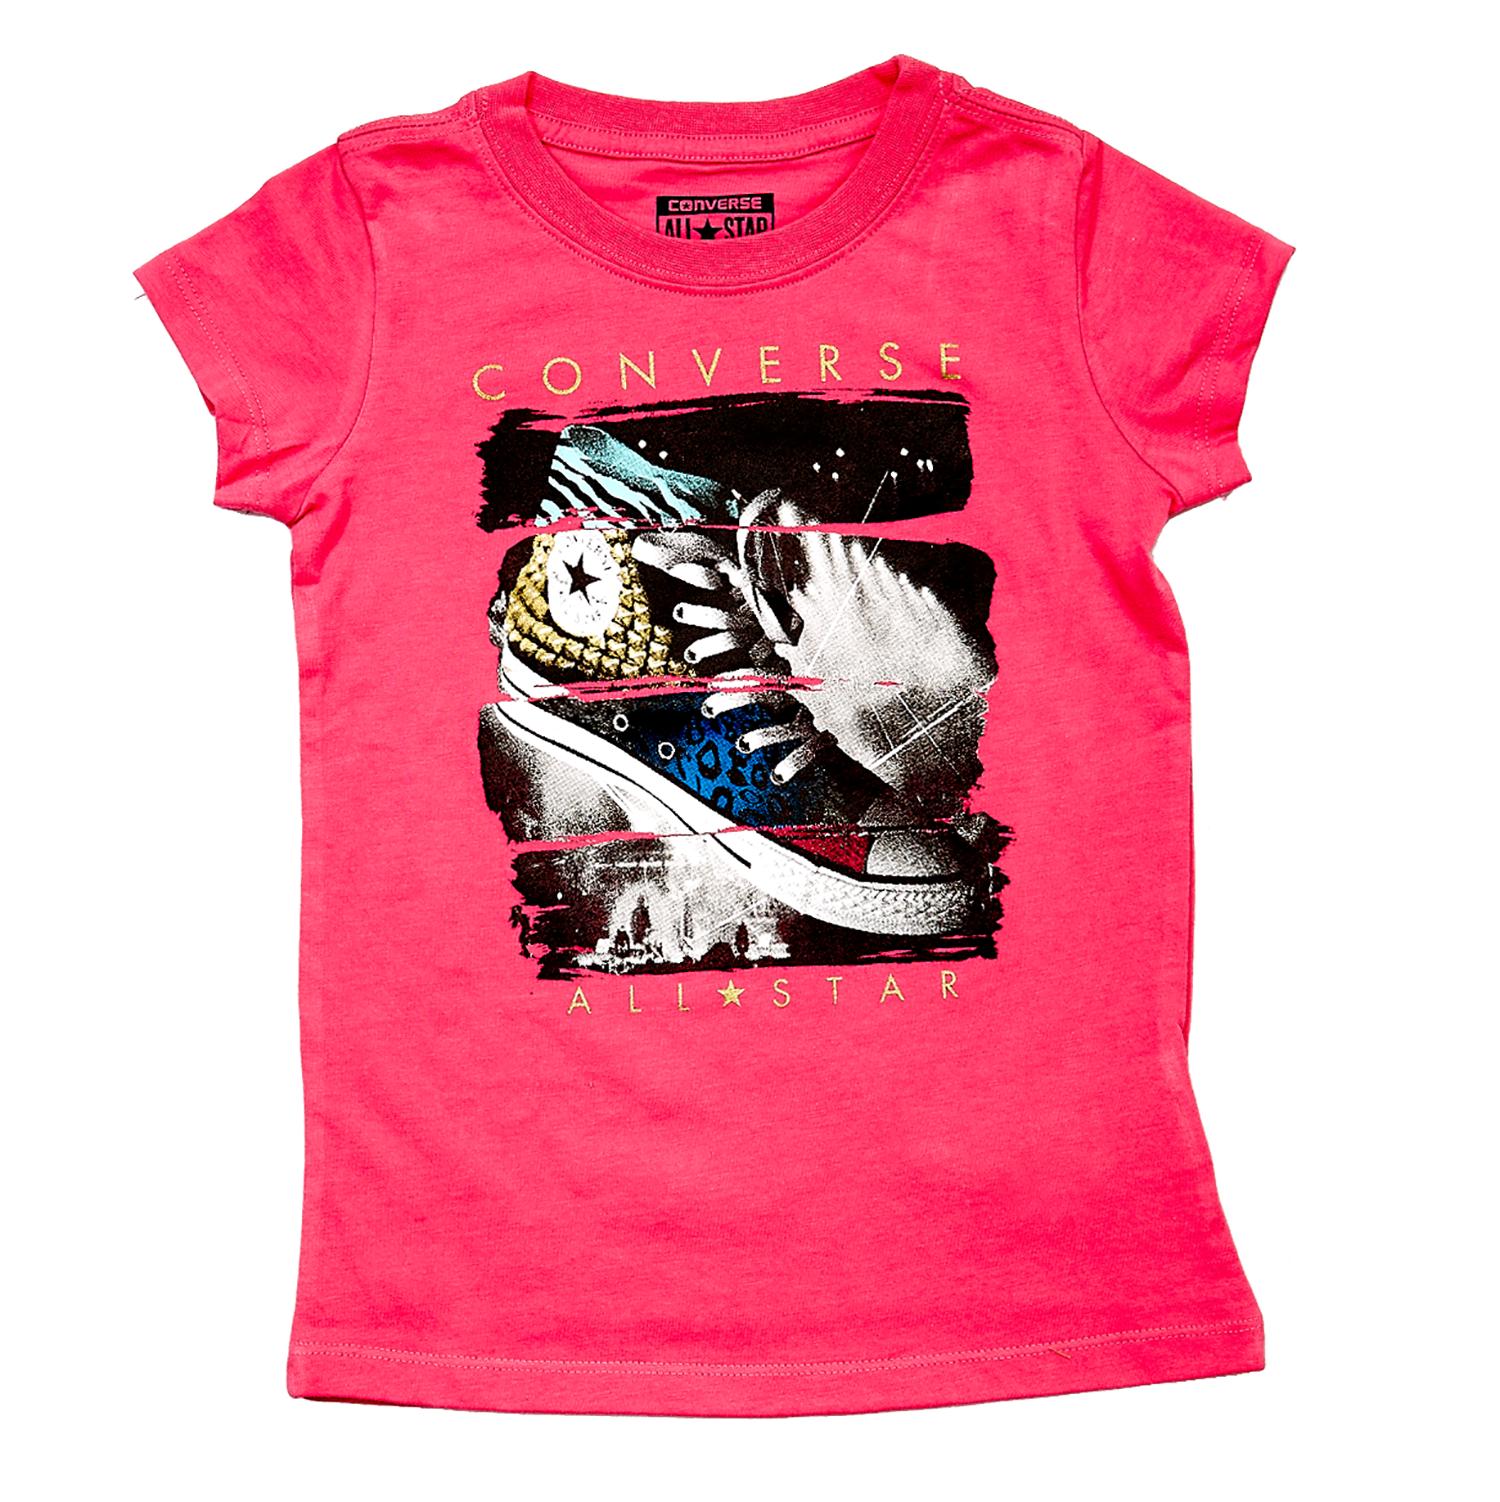 CONVERSE – Παιδική μπλούζα Converse φούξια